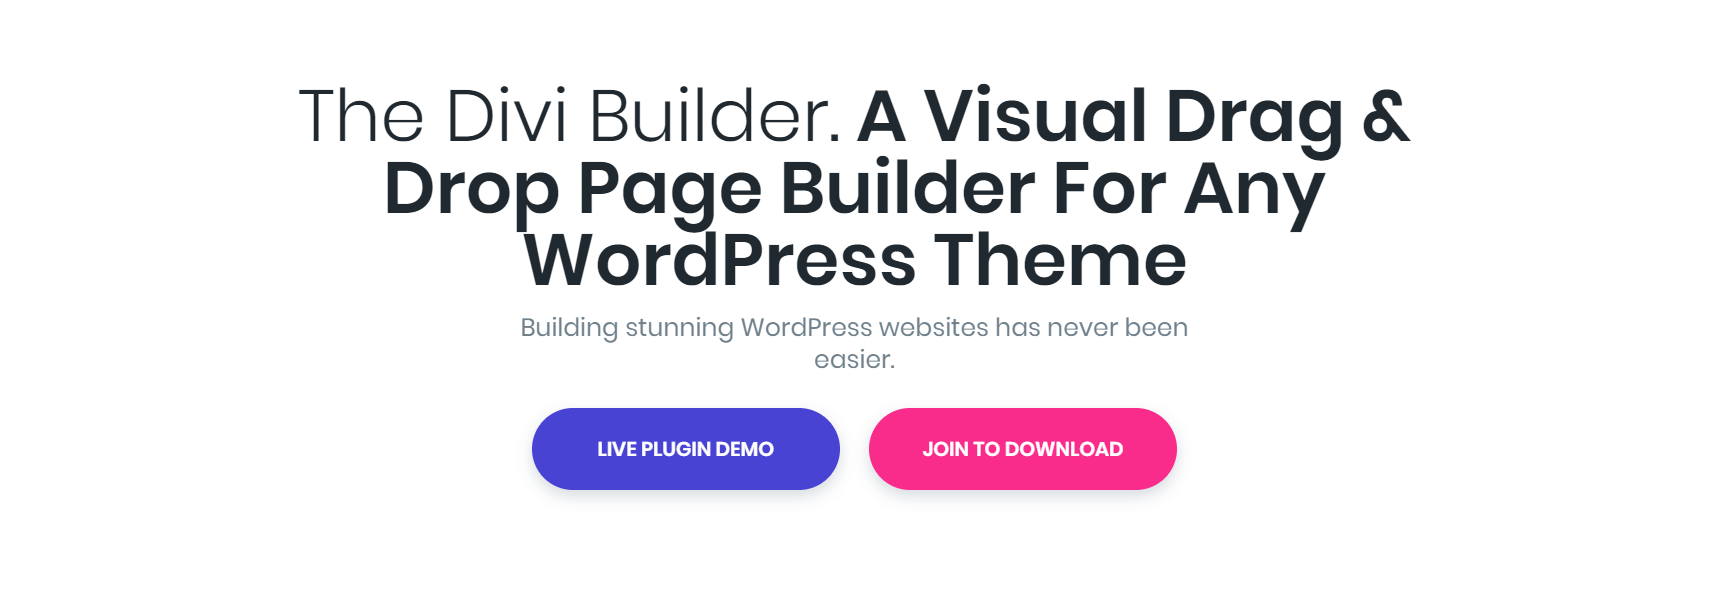 The Divi Builder website.